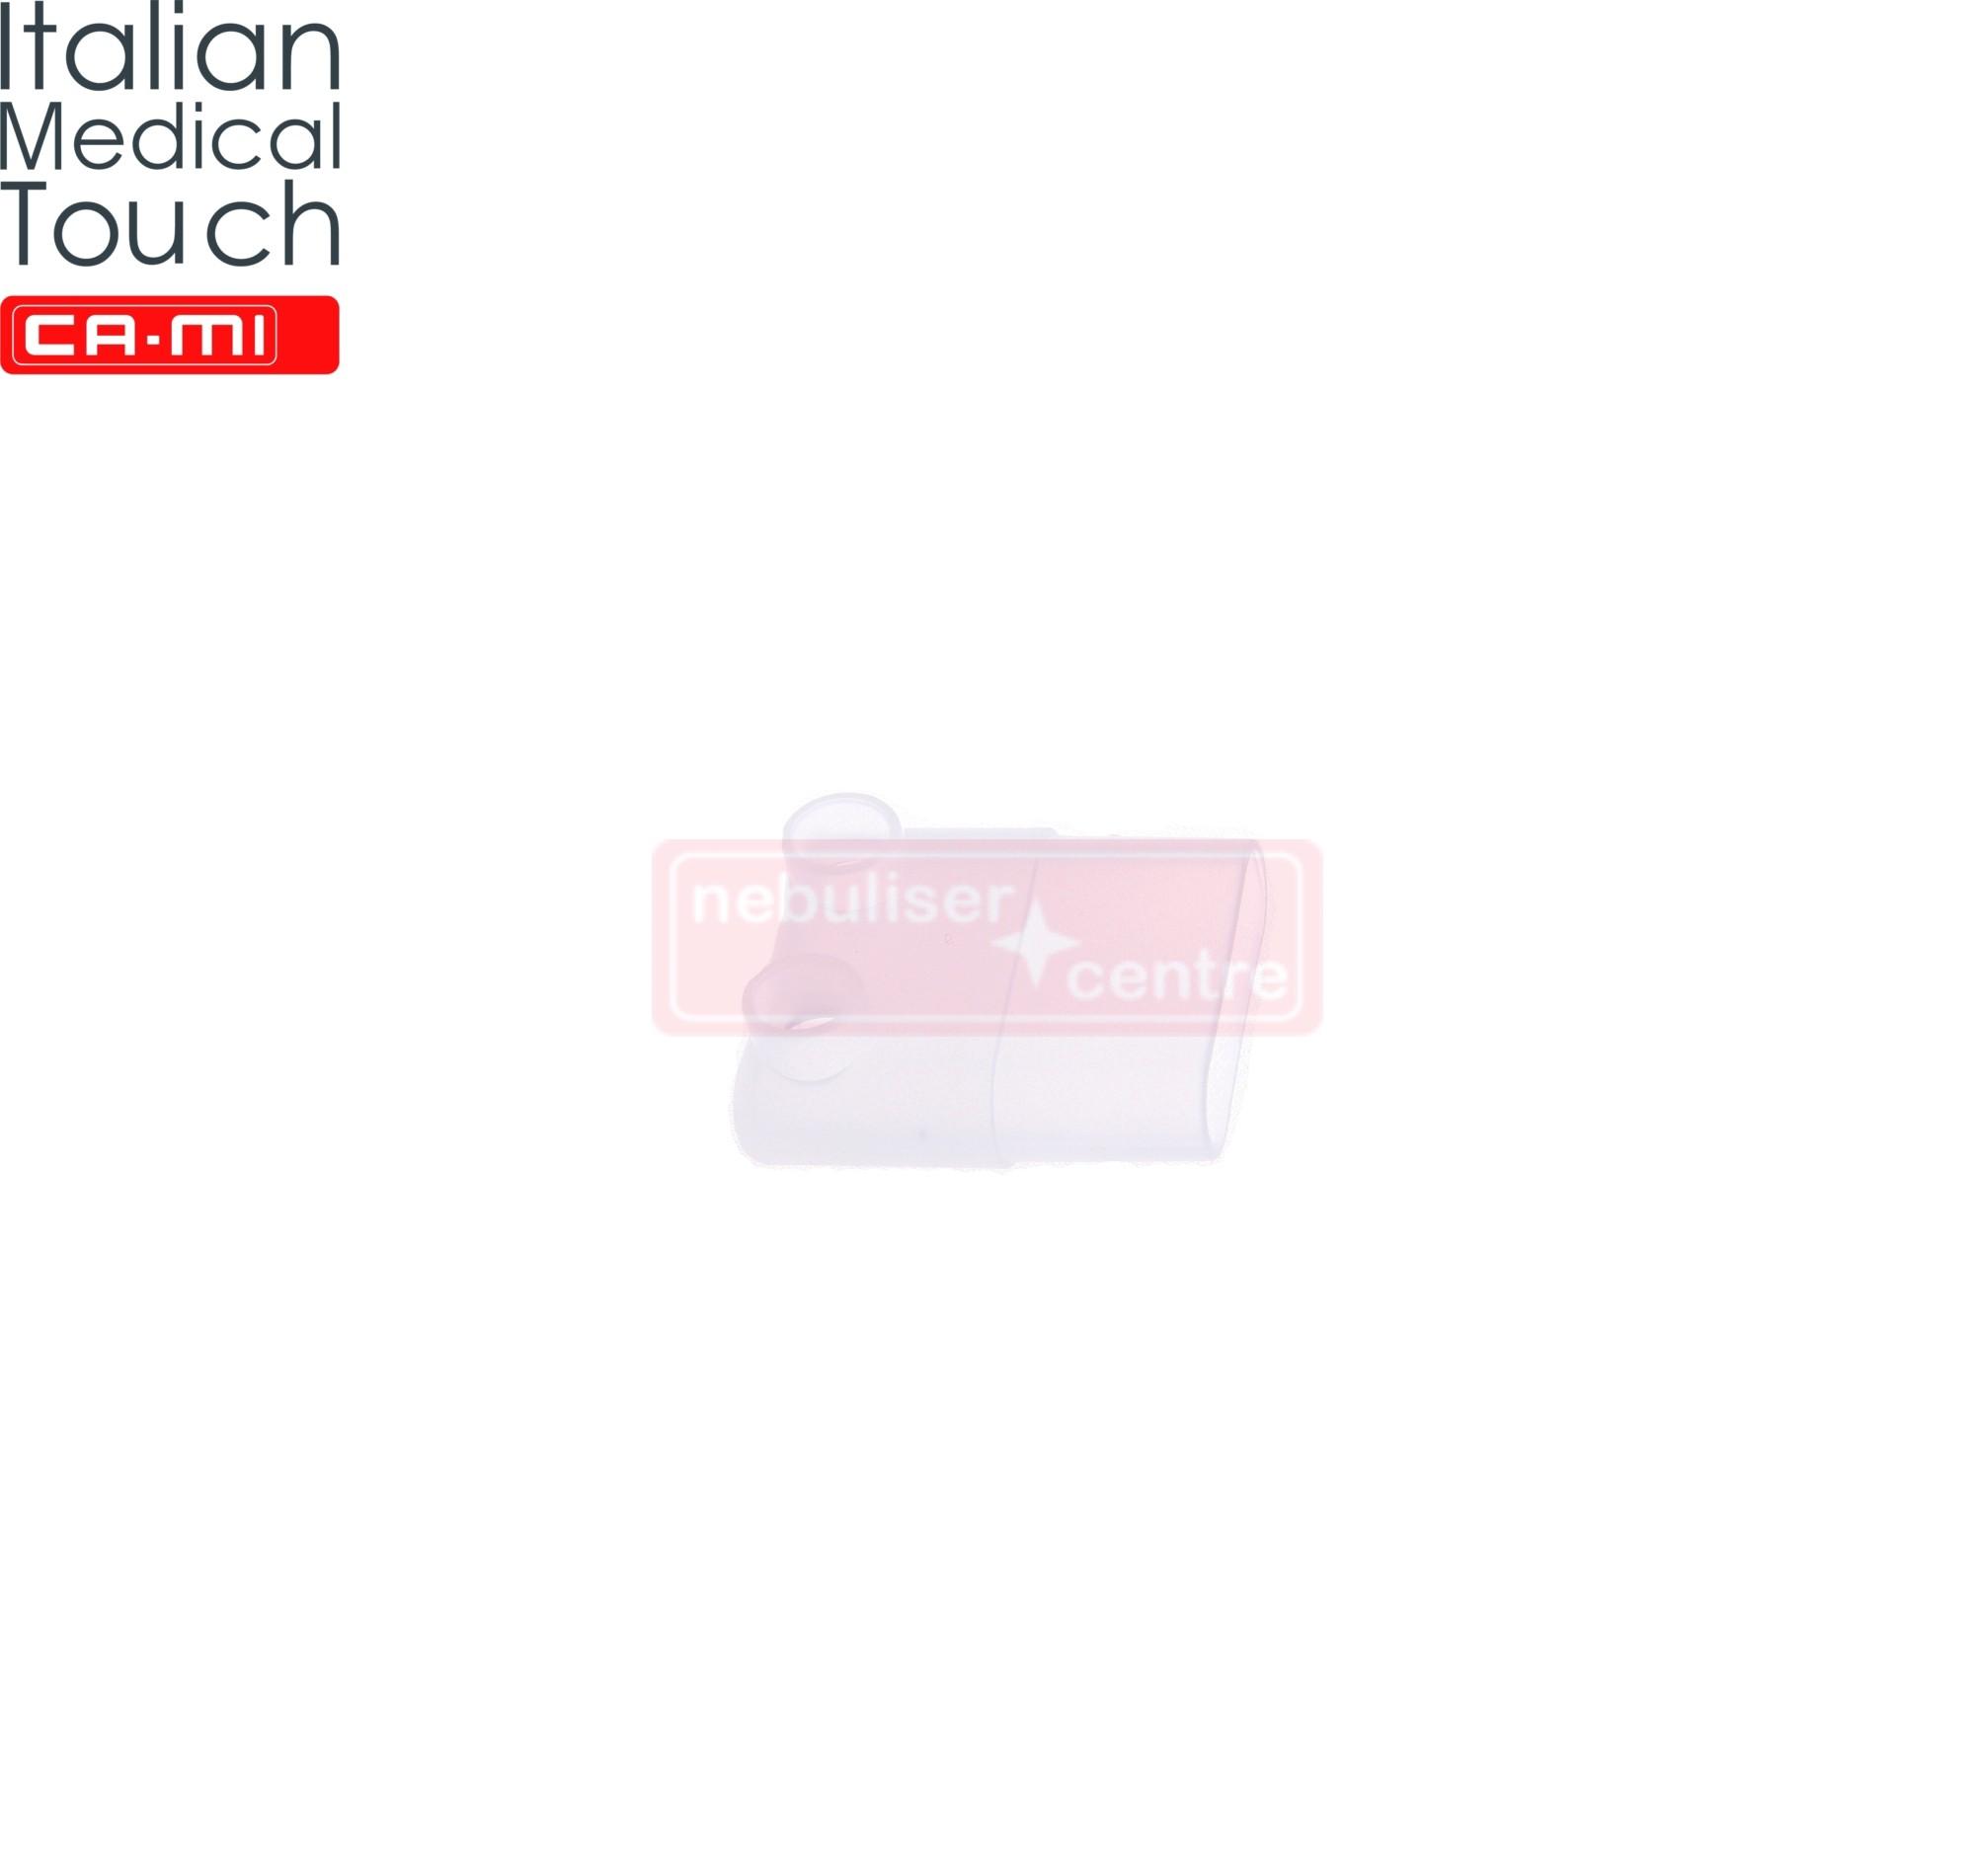 Nebuliser Nosepiece for CA-MI HiFlo nebulisers